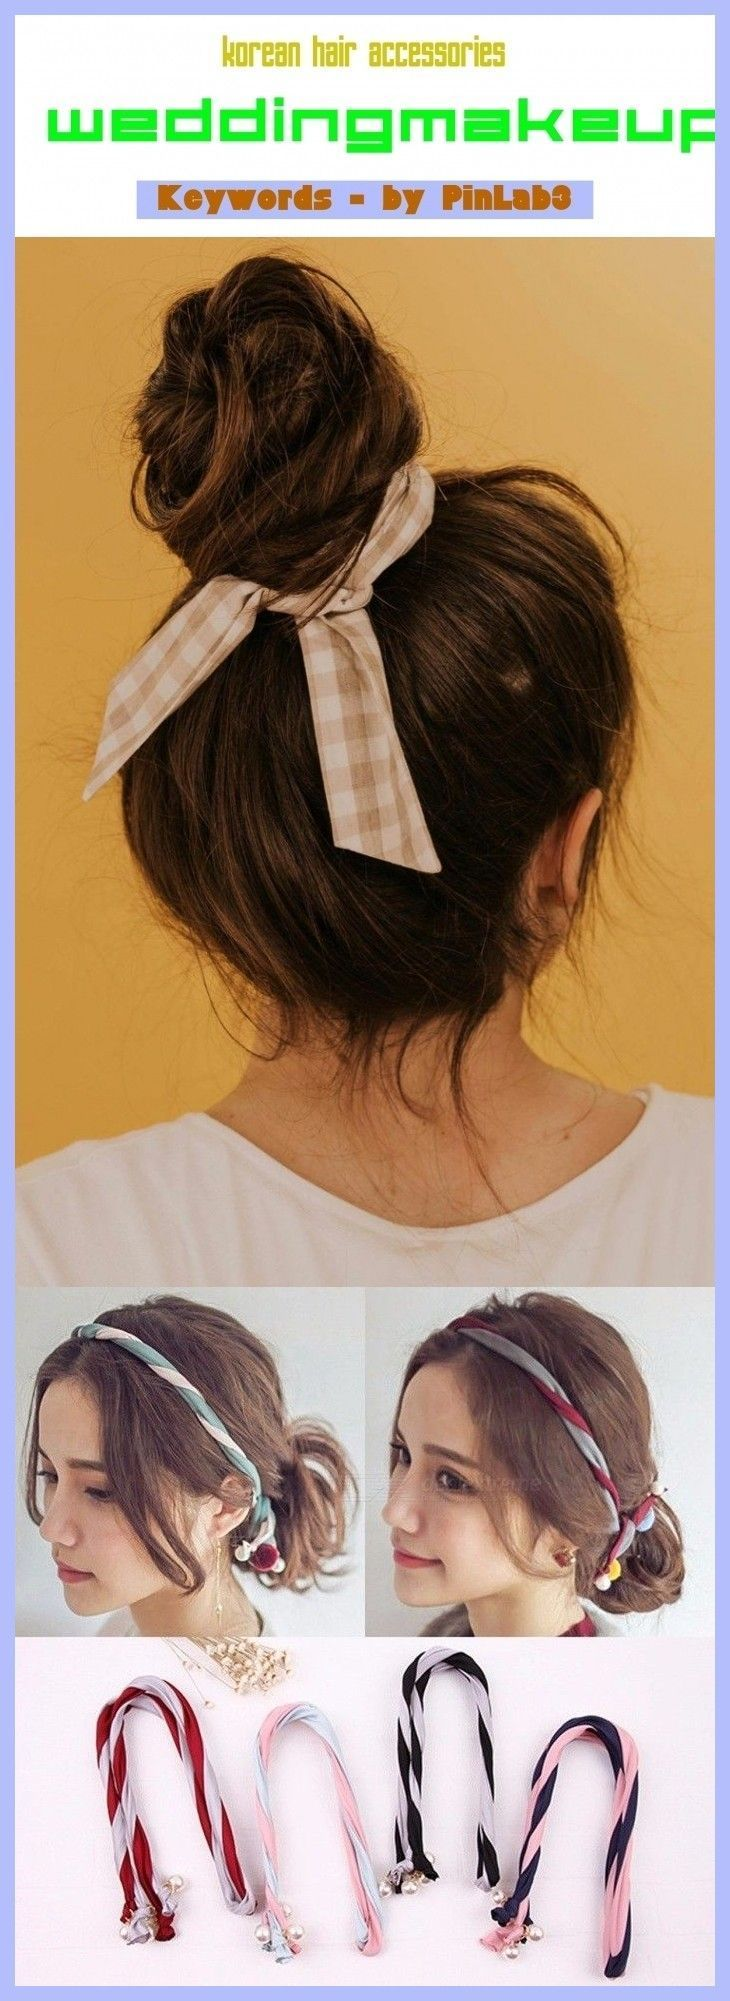 Korean Hair Accessories Korean Accessories Koreanische Haarzusatze Accessoi Korean Hair Access In 2020 Korean Hairstyle Hairstyles With Bangs Korean Hair Color